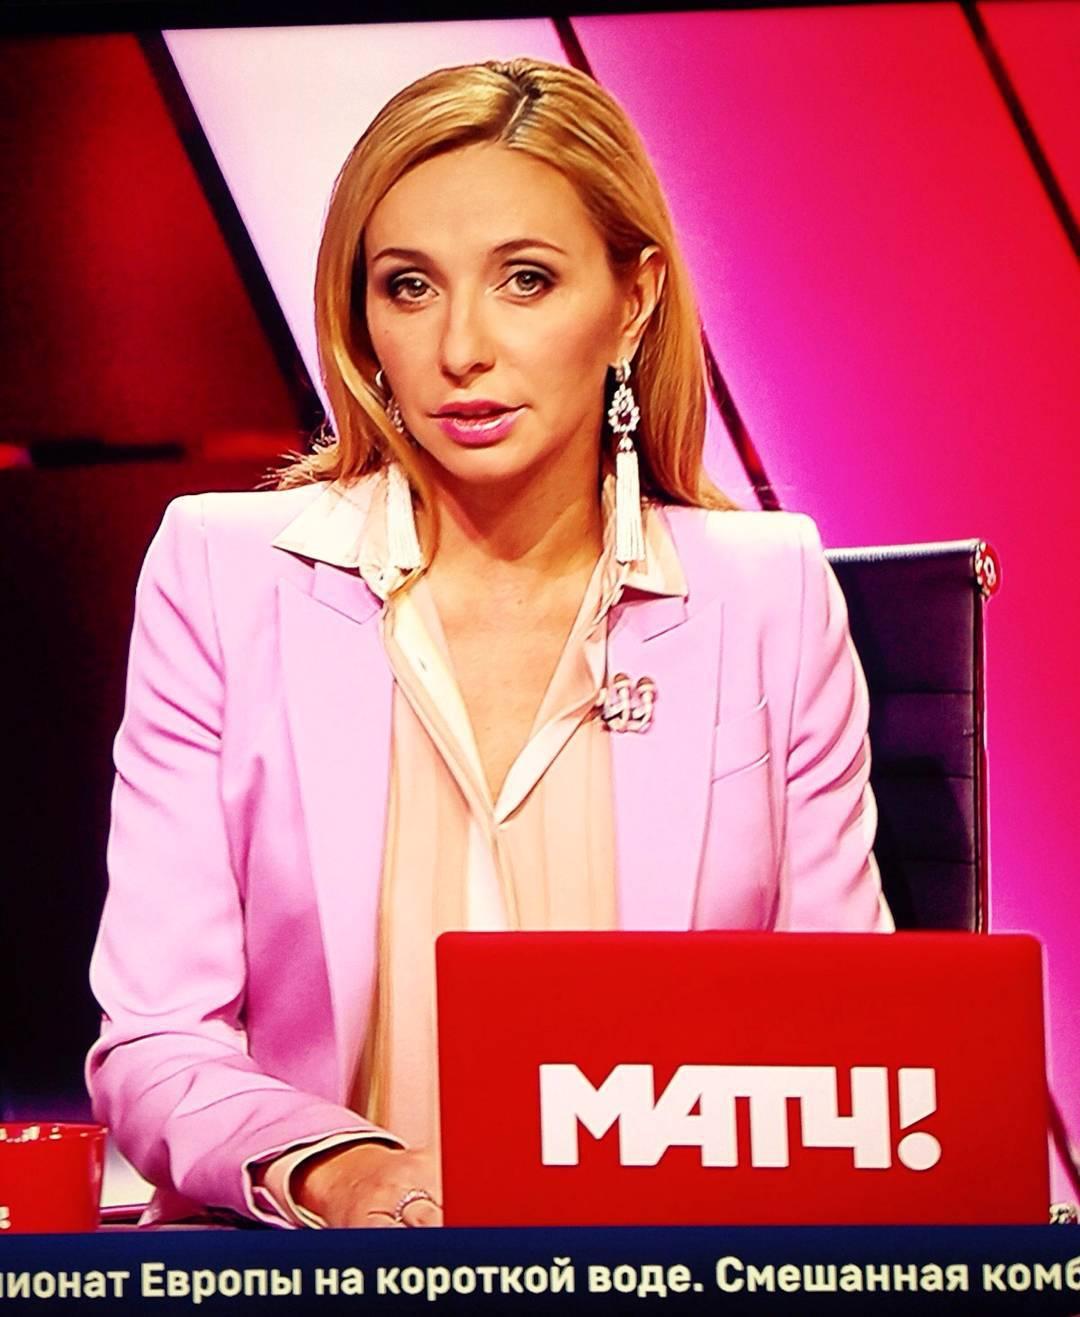 Татьяна Навка - ведущая канала Матч-ТВ - Страница 5 12353810